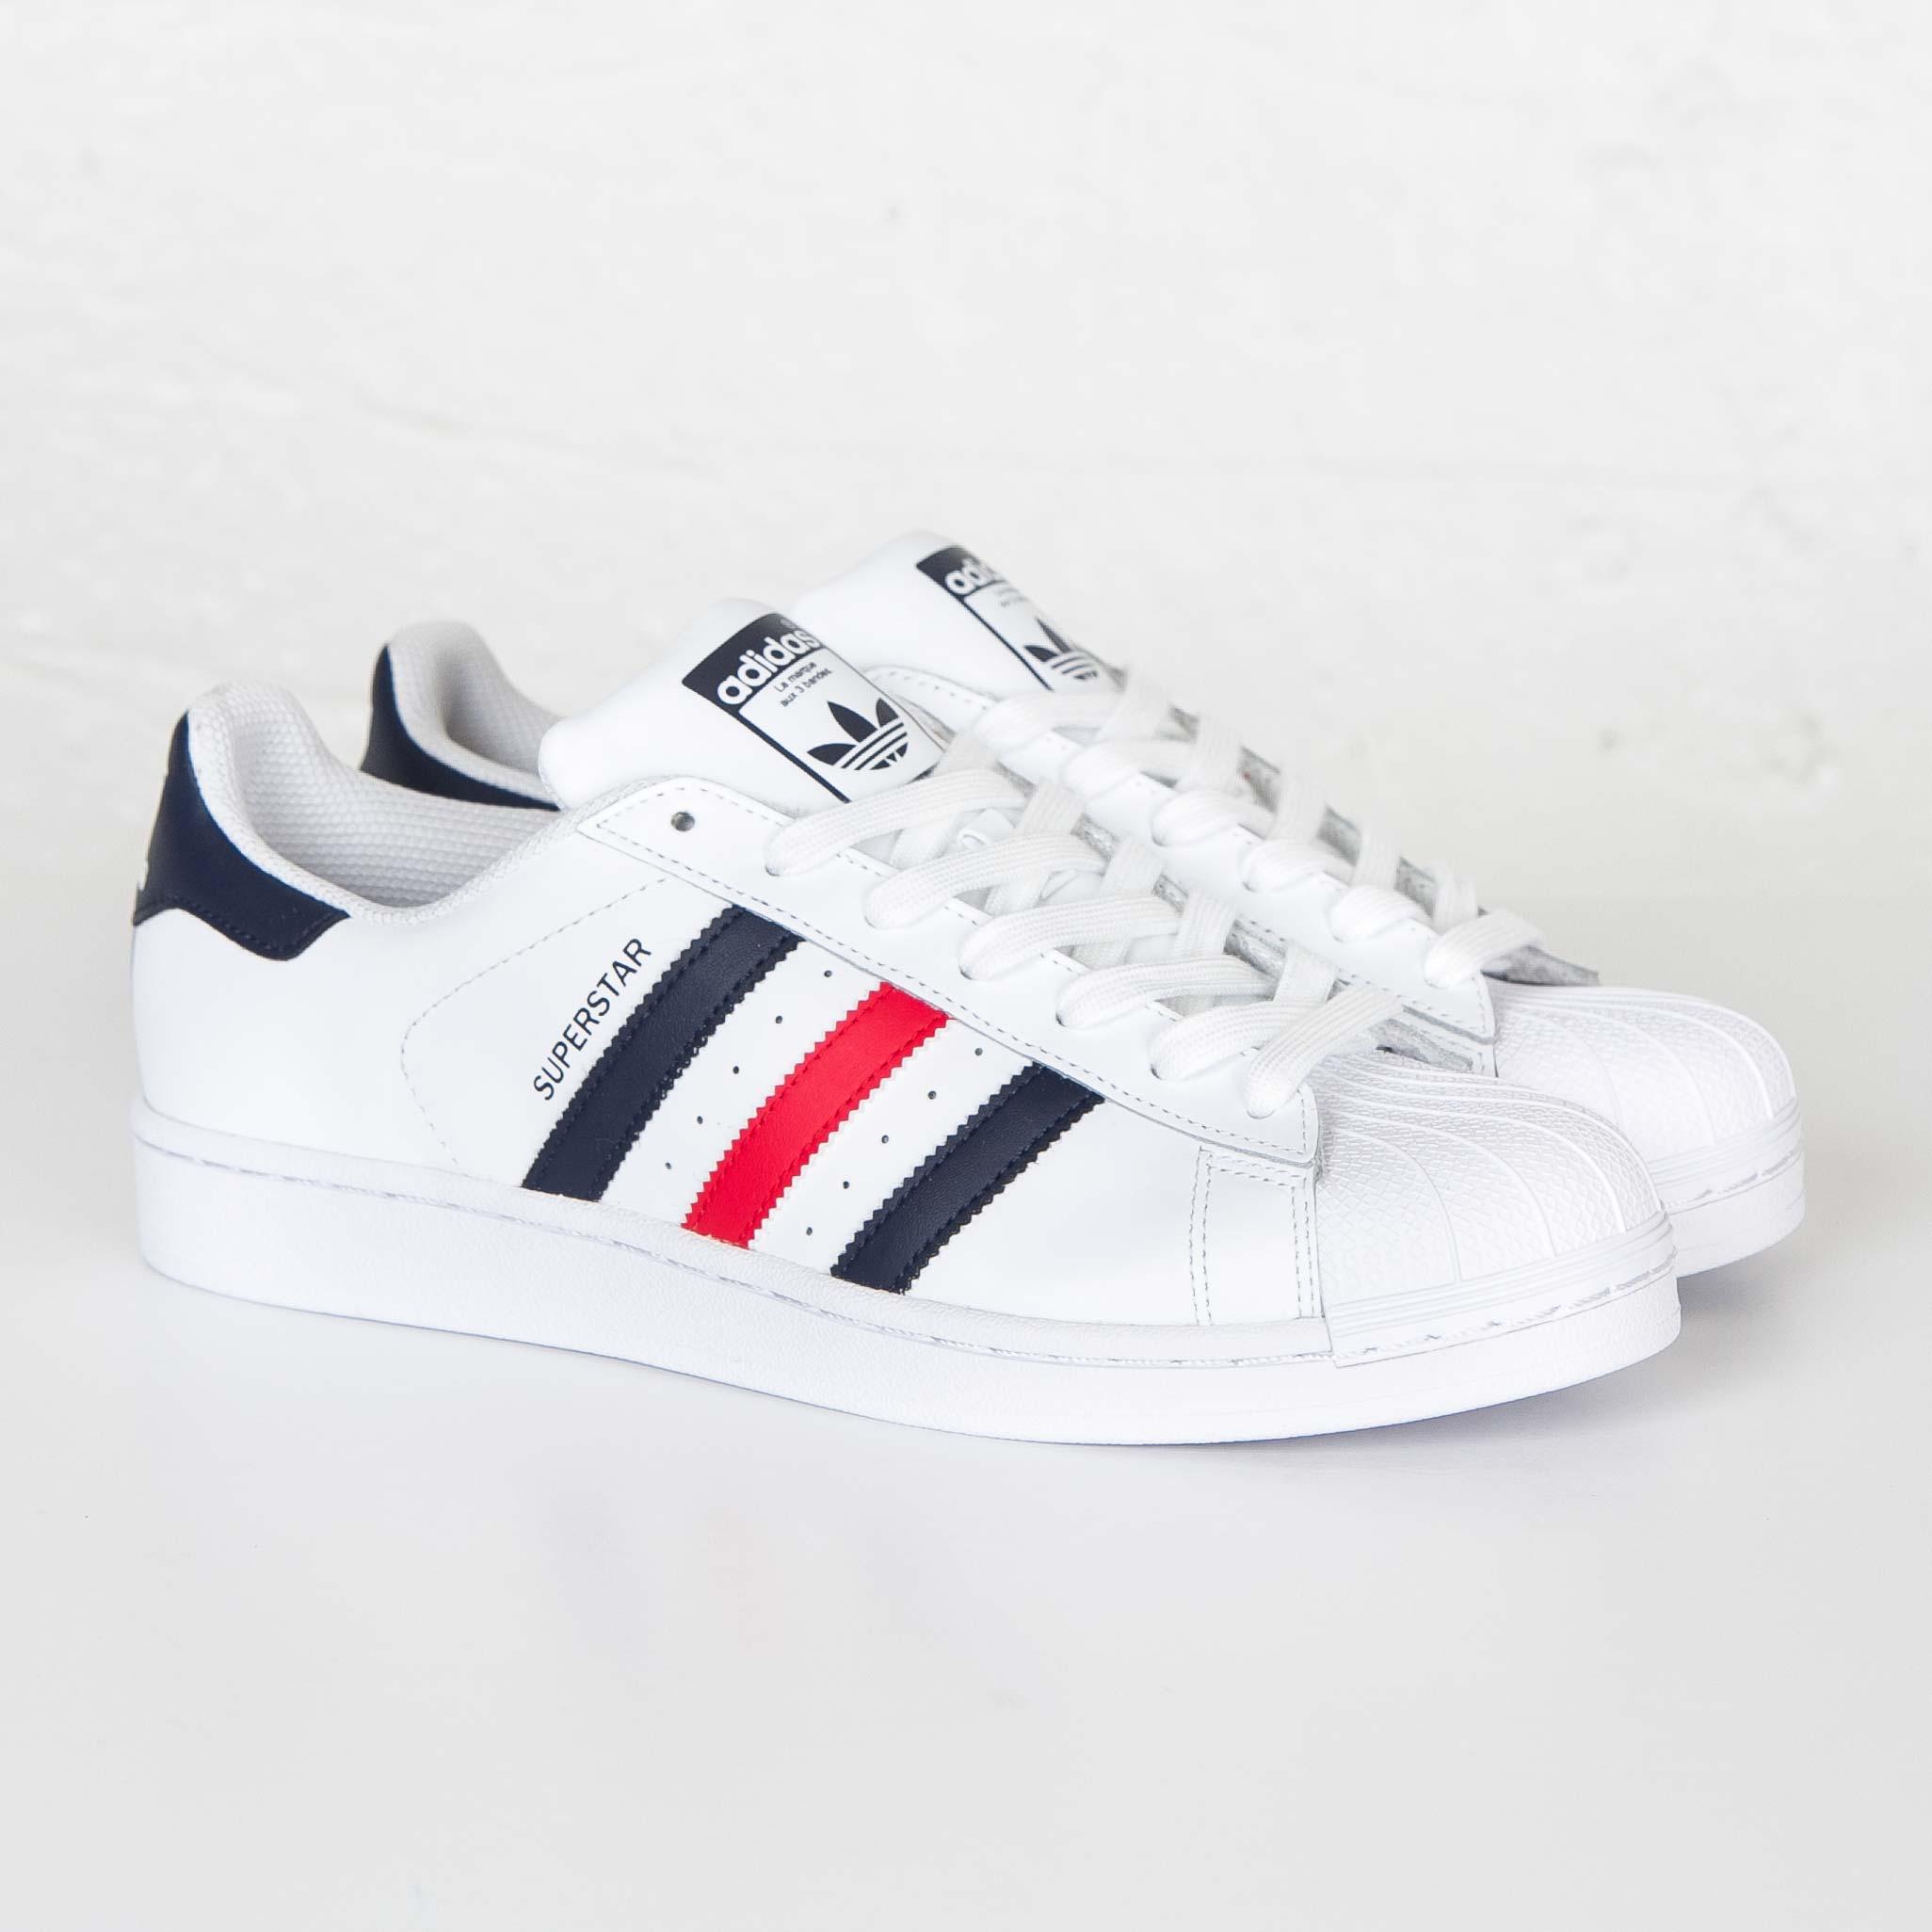 adidas superstar foundation schoenen zwart